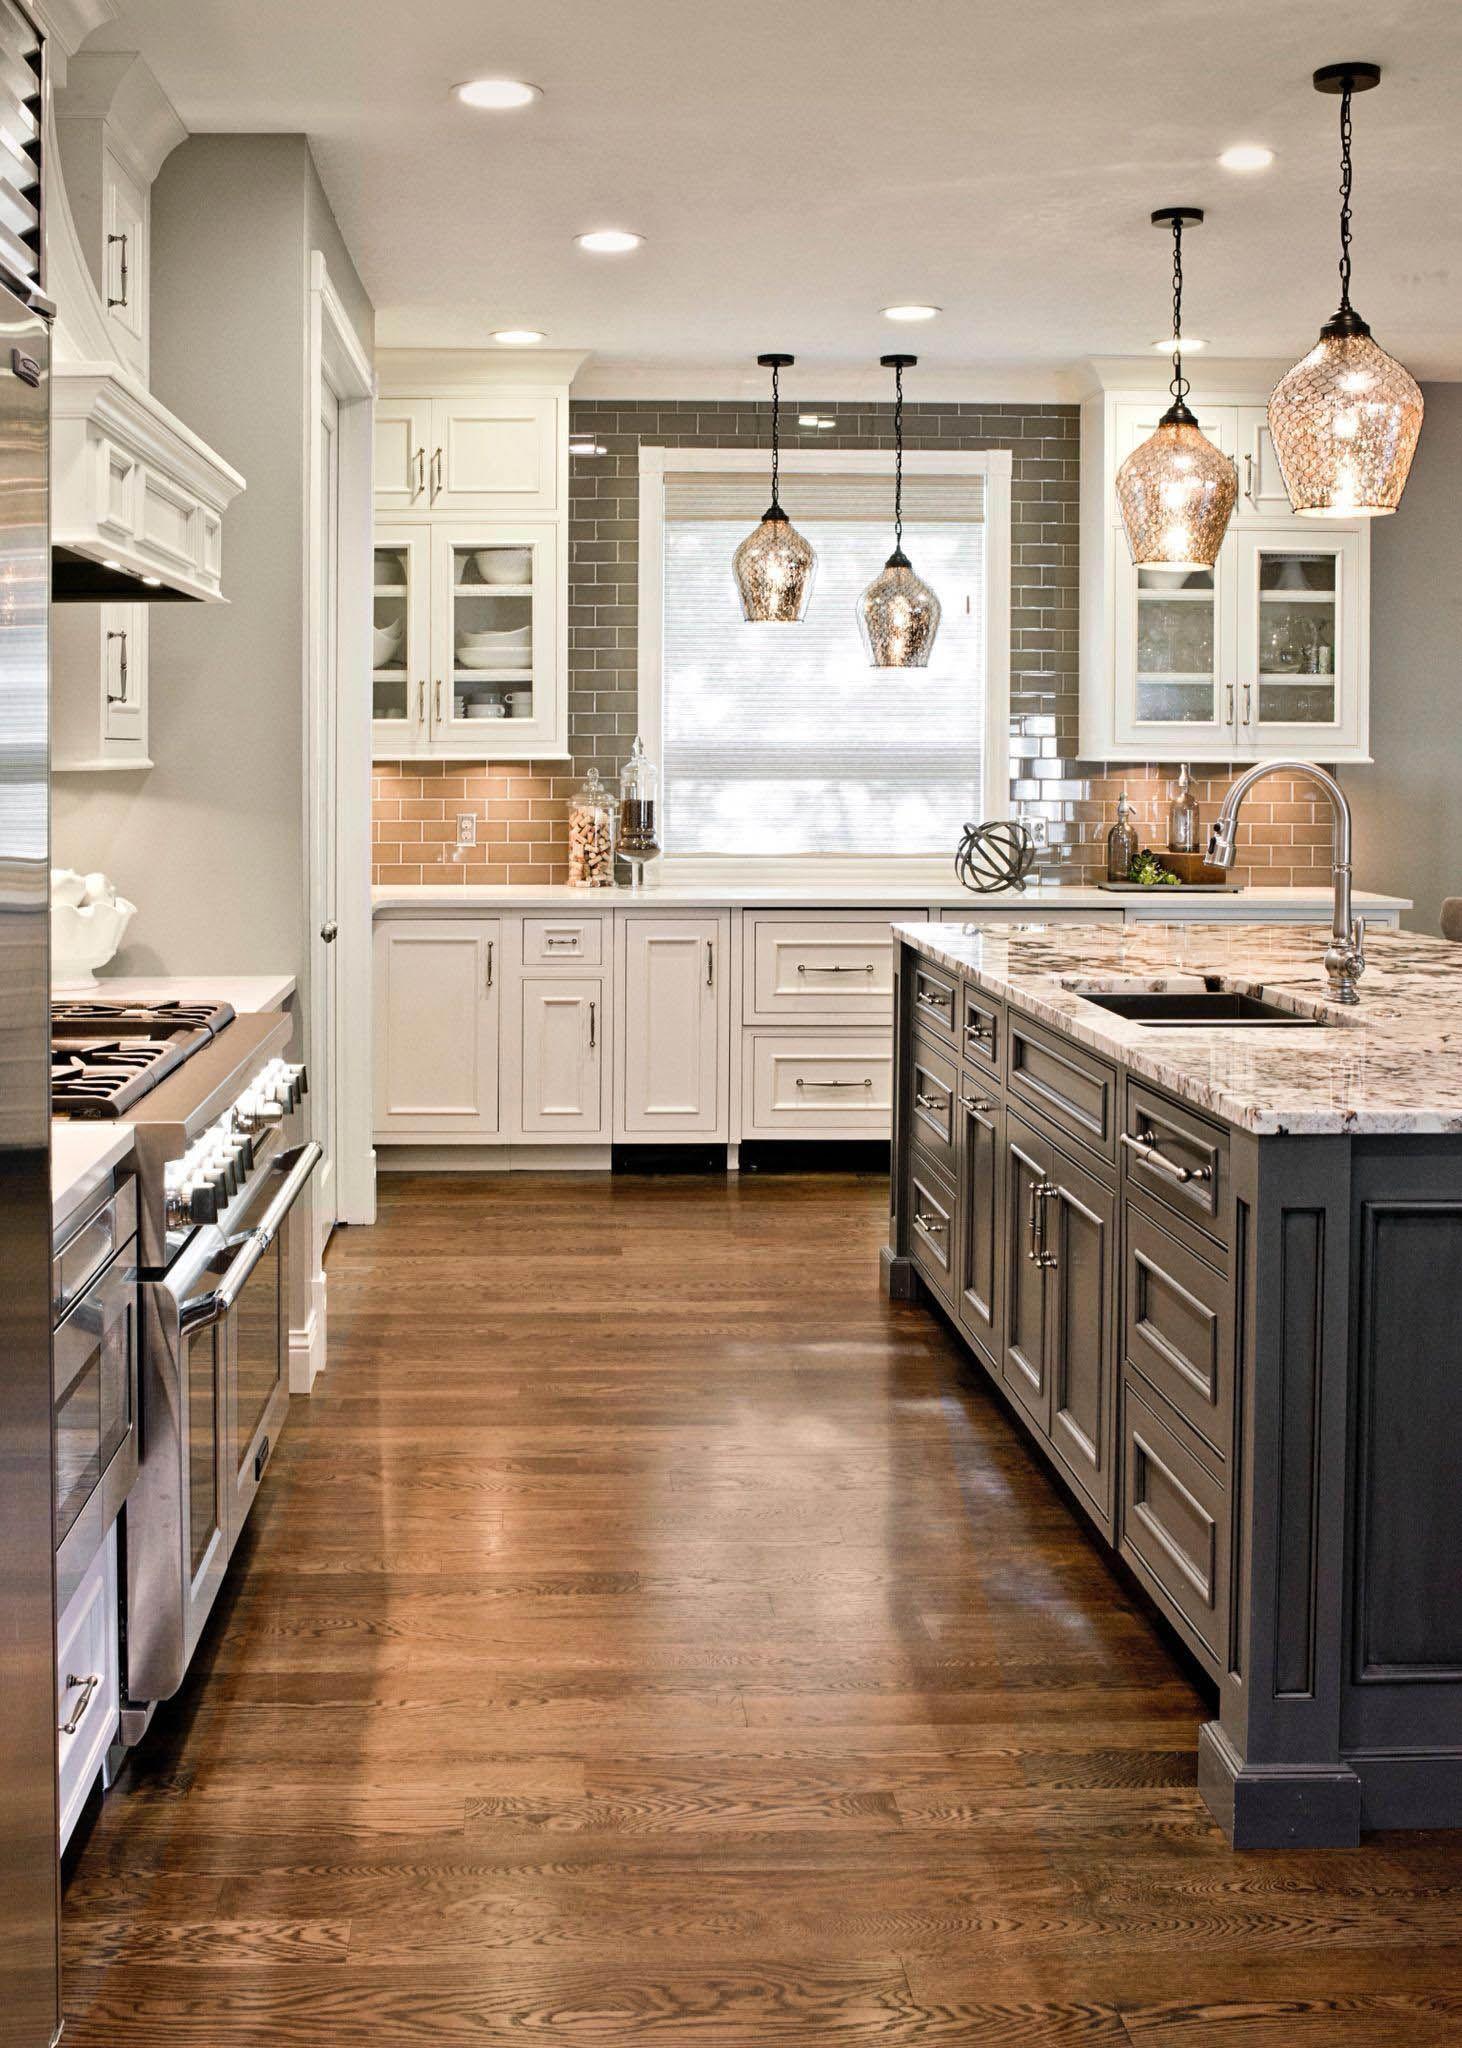 Ways To Style Gray Kitchen Cabinets Kitchen Backsplash Designs Kitchen Tile Backsplash With Oak Wood Floor Kitchen